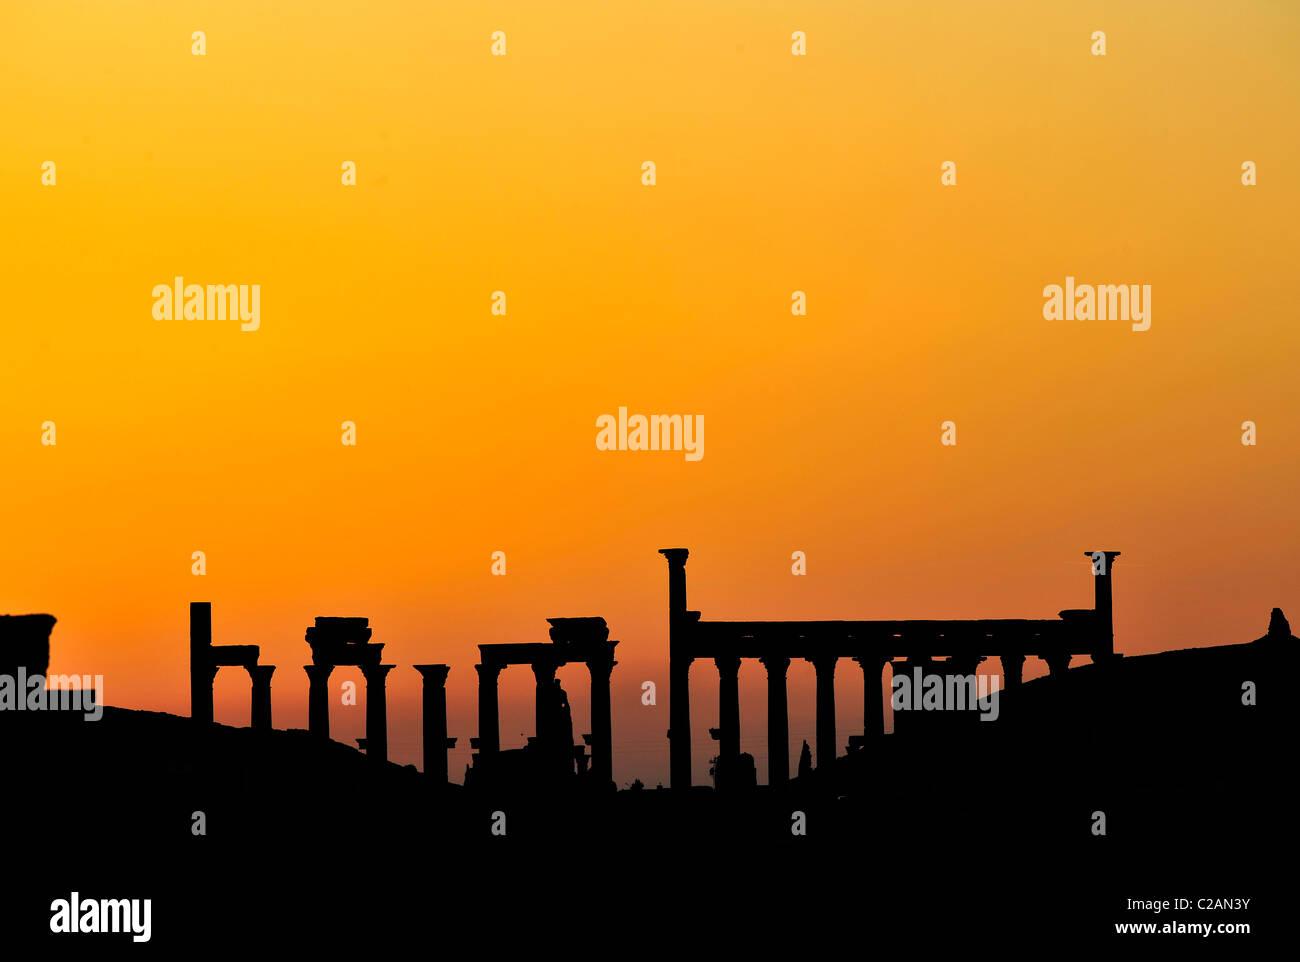 Roman ruins during sunset in Palmyra, Syria on March 4, 2011. Sonnenuntergang über den Ruinen, Säulen - Stock Image